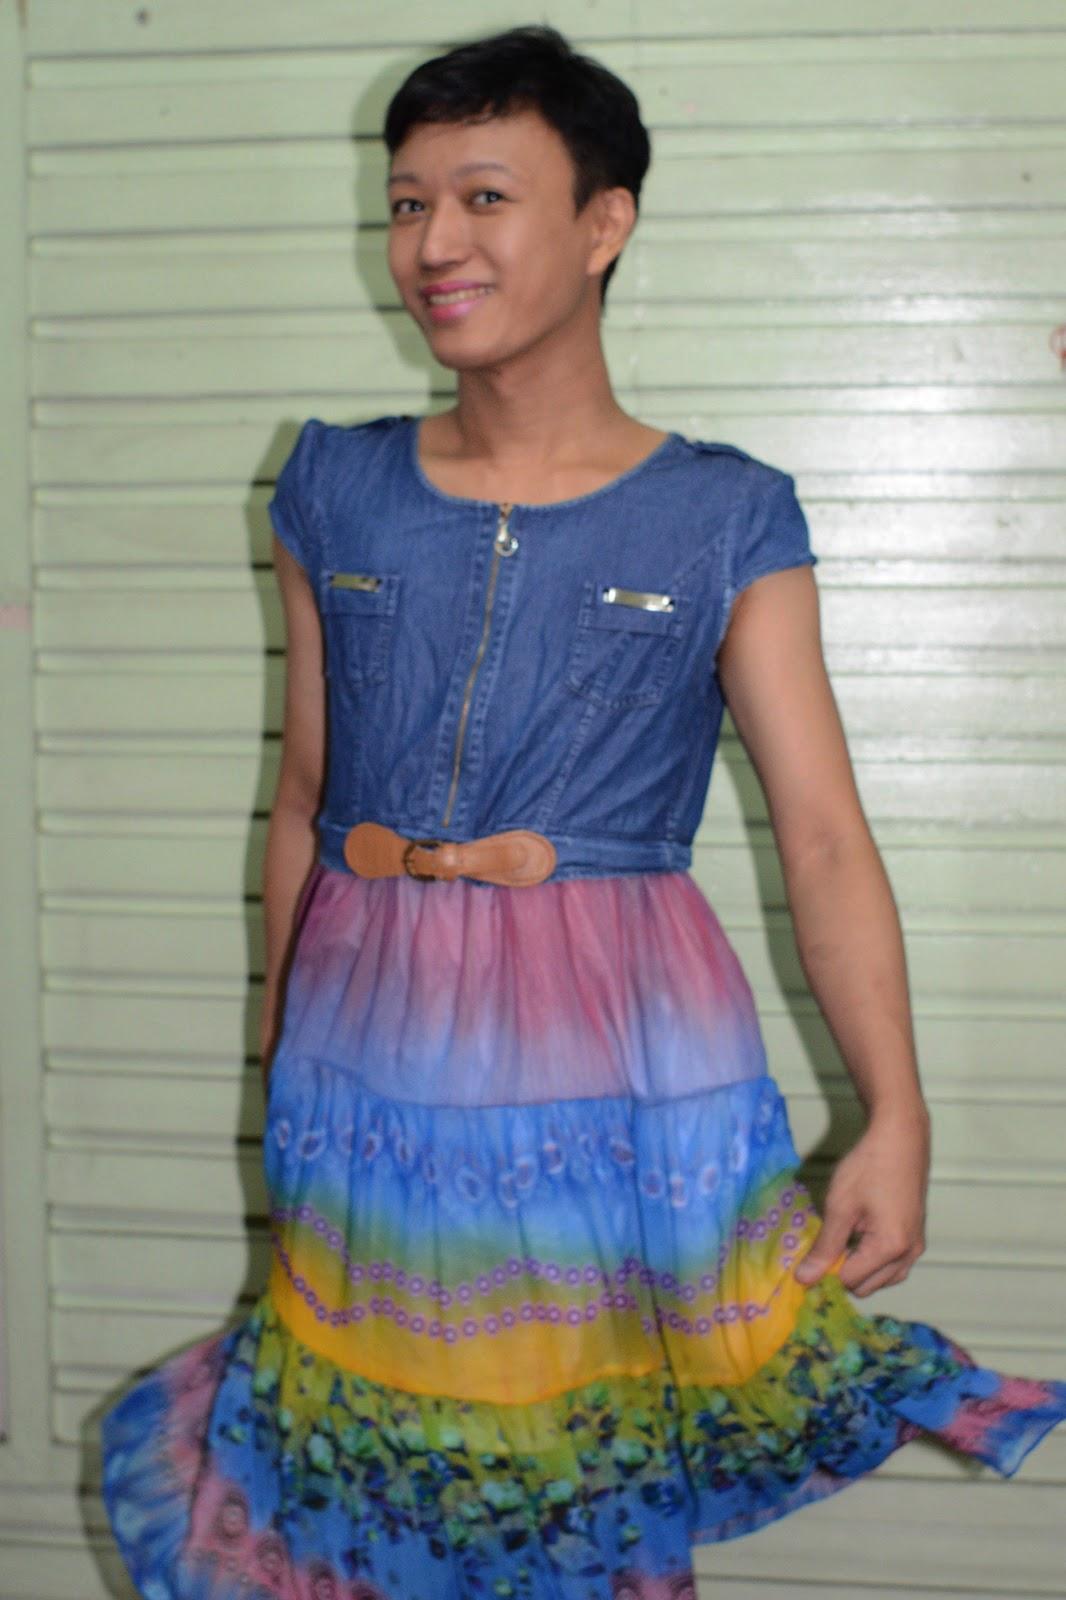 Playing Dressed Up Girl Again, Feeling Mudel